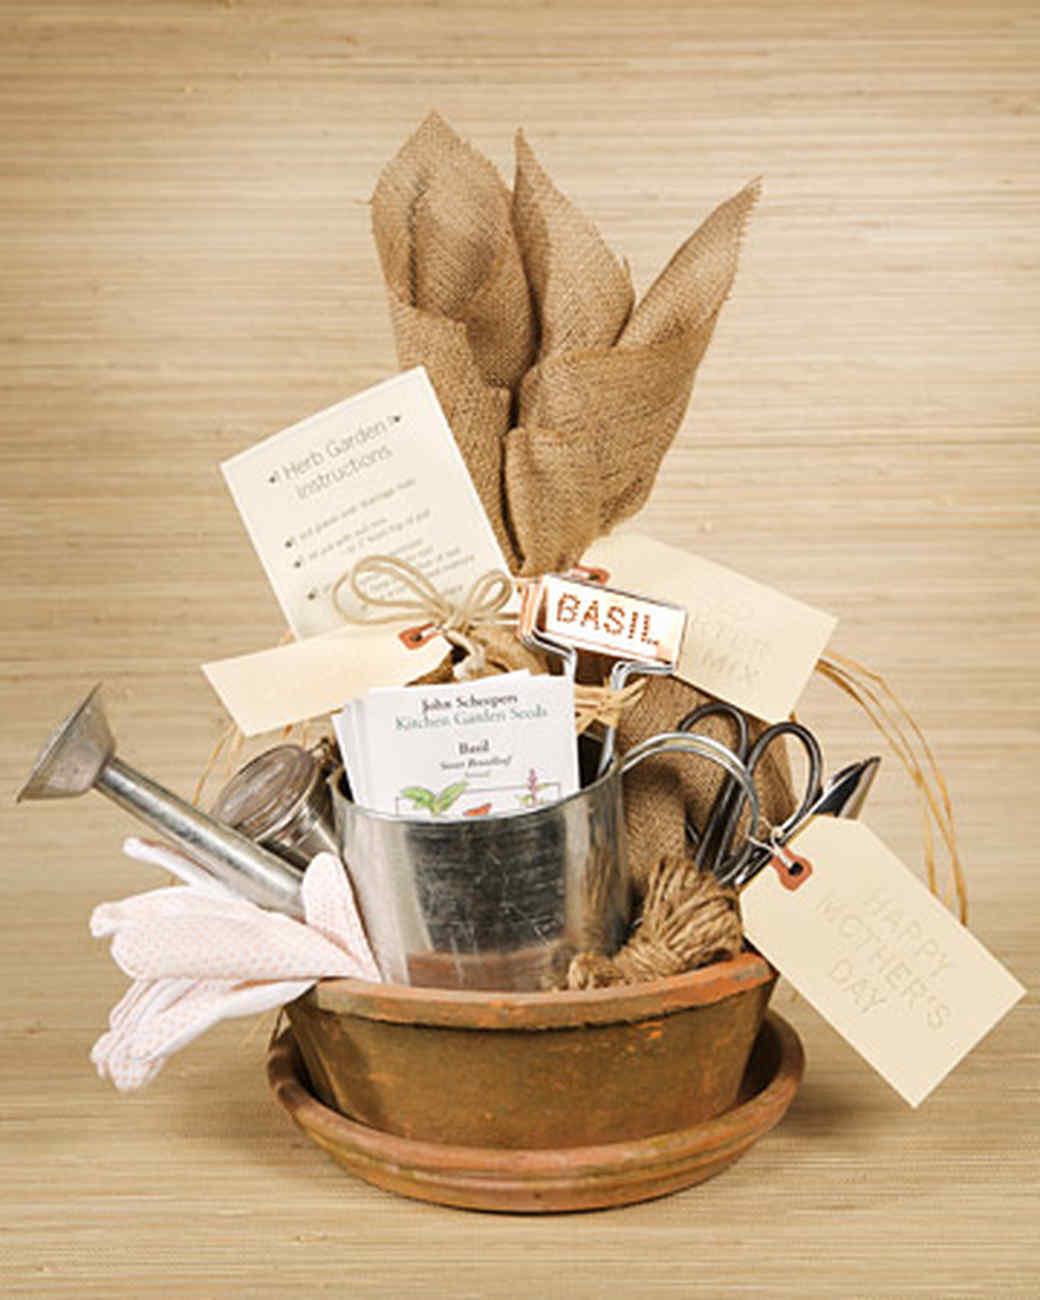 Mother's Day Herb Garden Kit